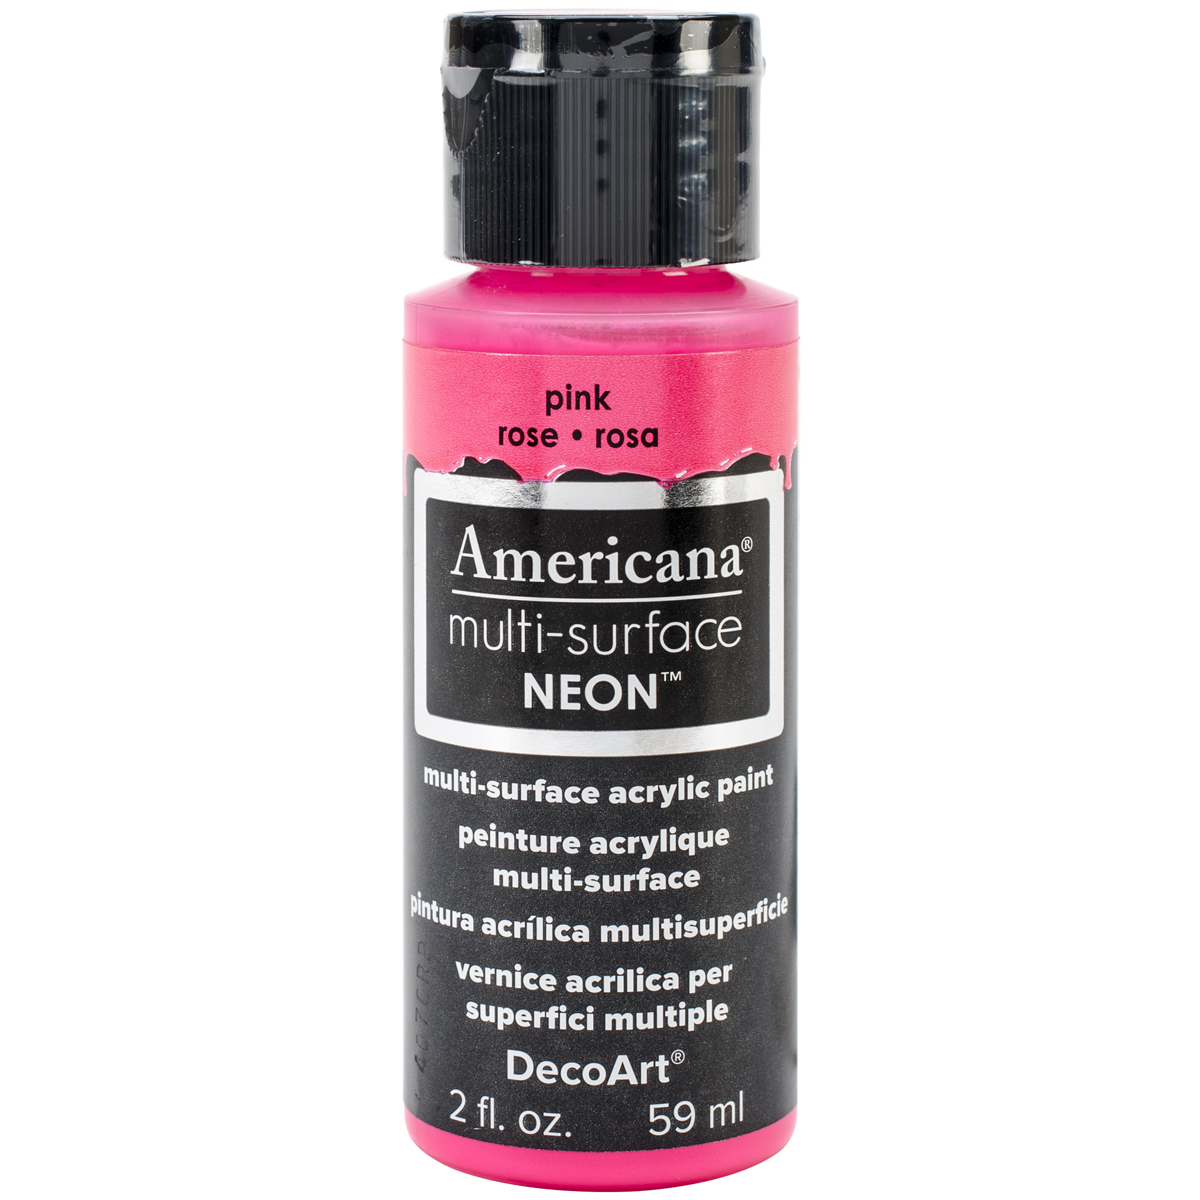 Americana Multi-Surface Neon Acrylic Paint 2oz-Pink